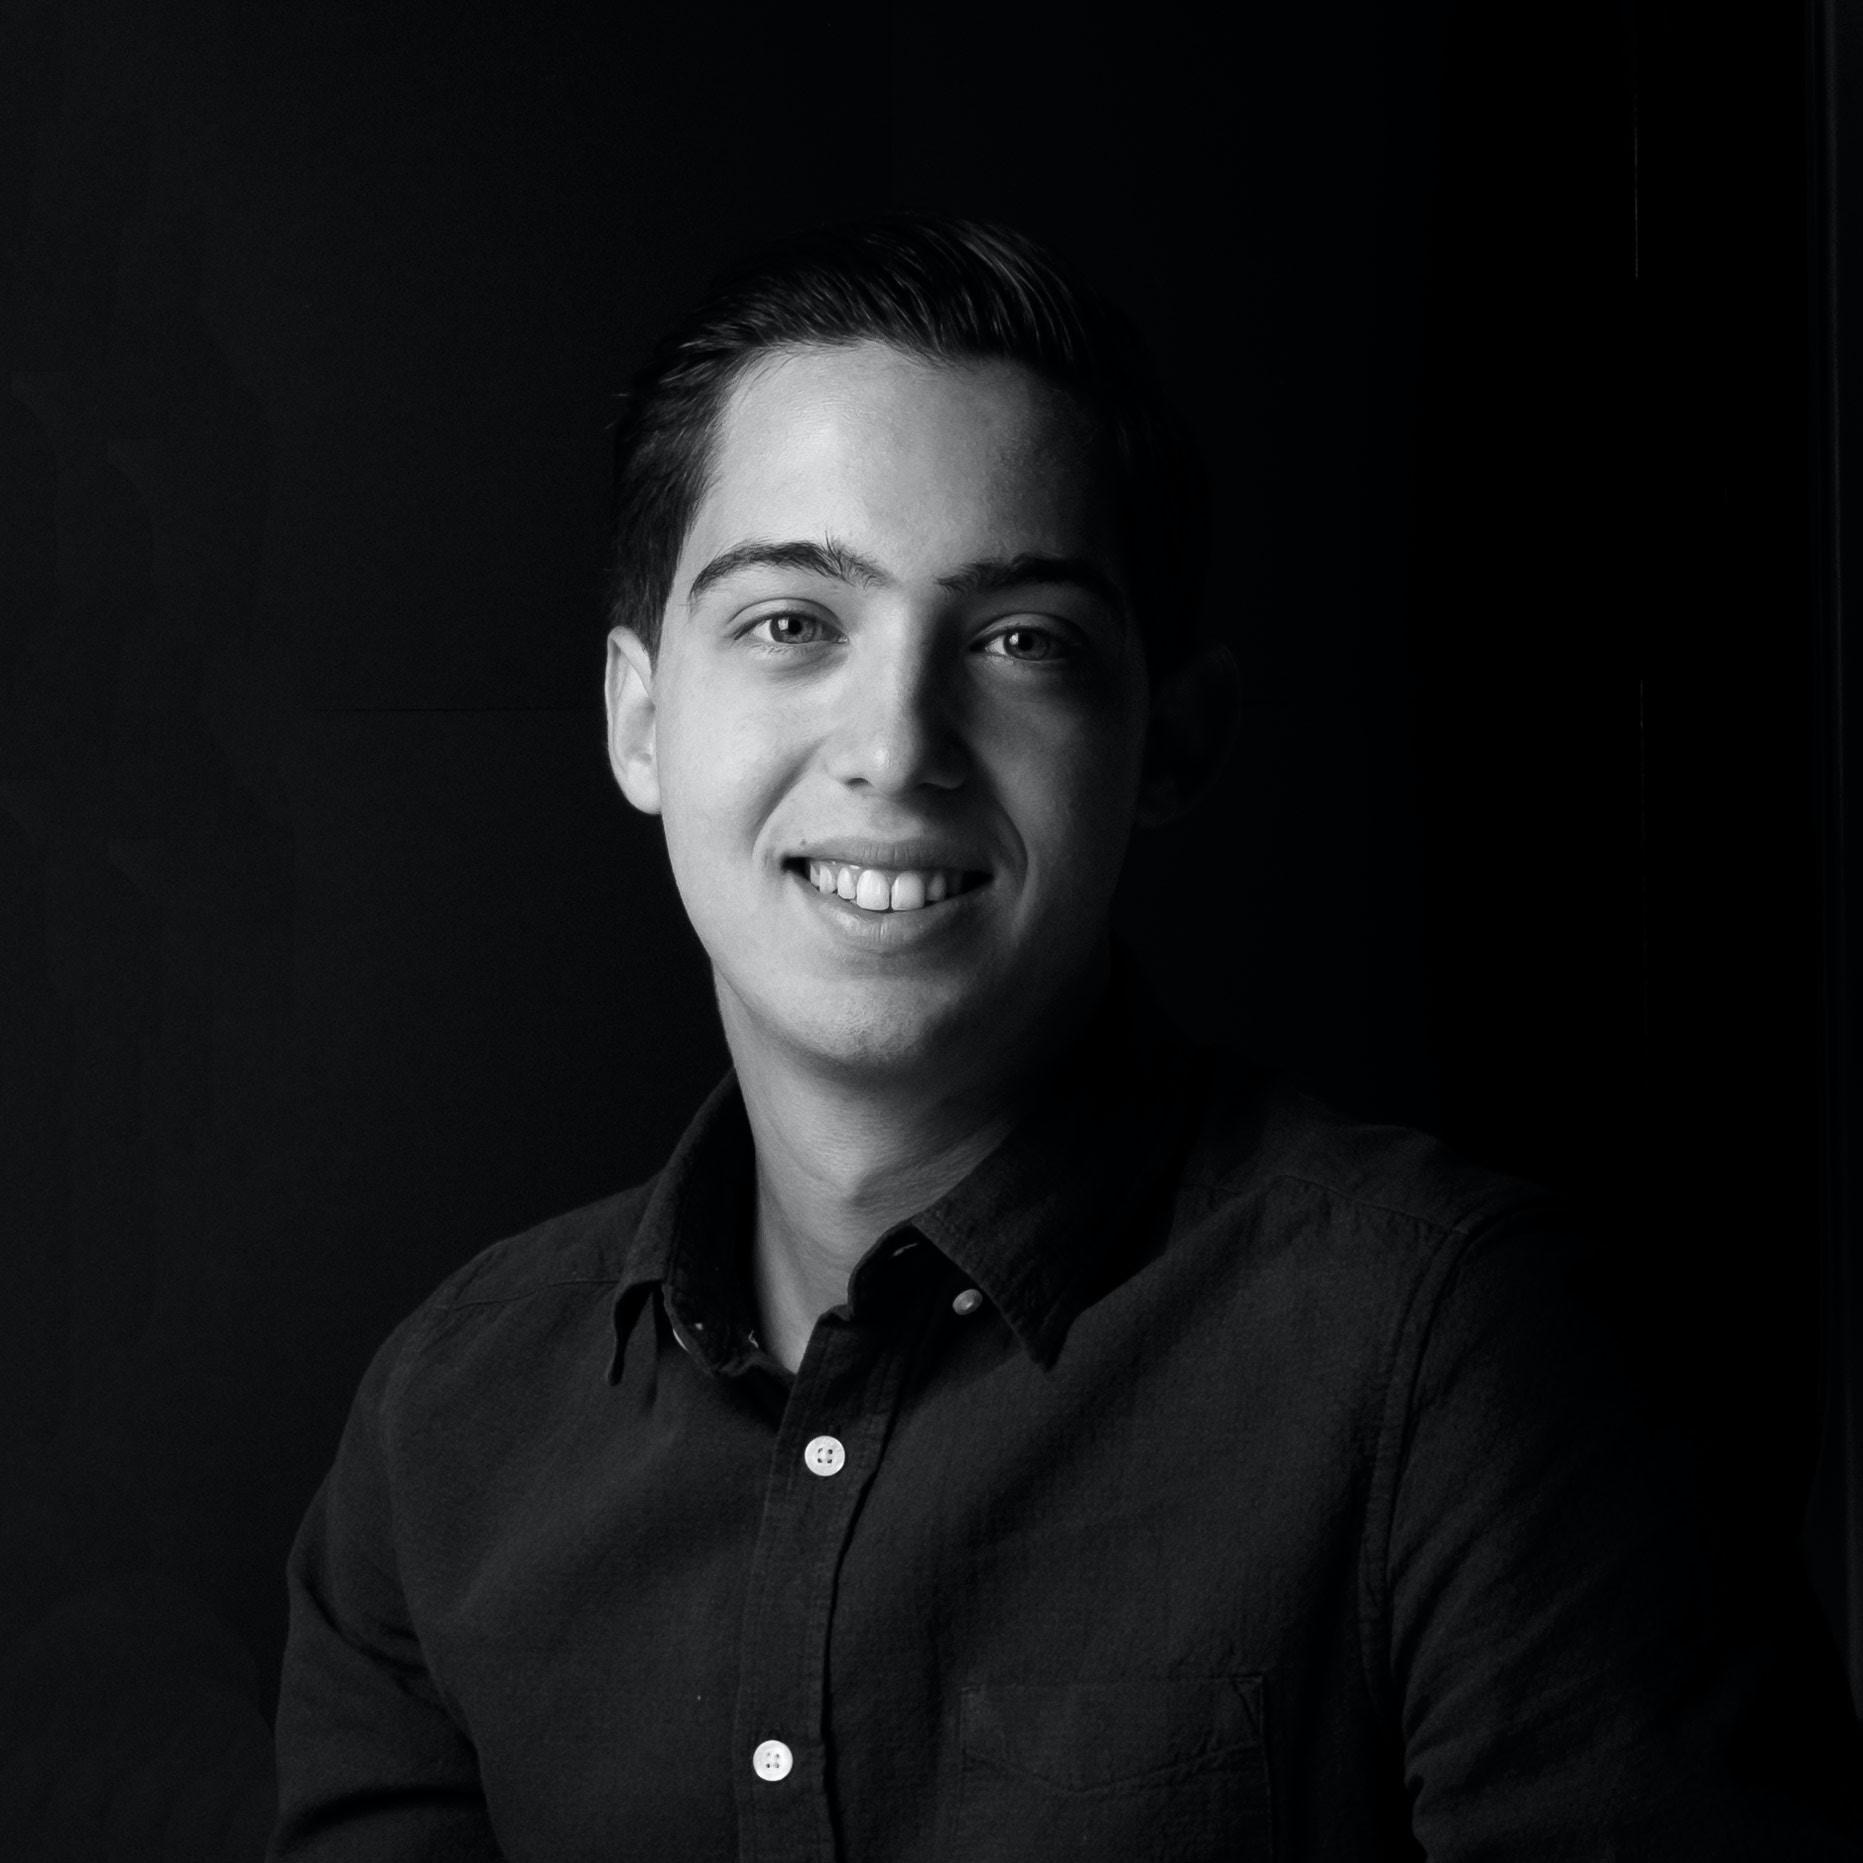 Dylan Gialanella